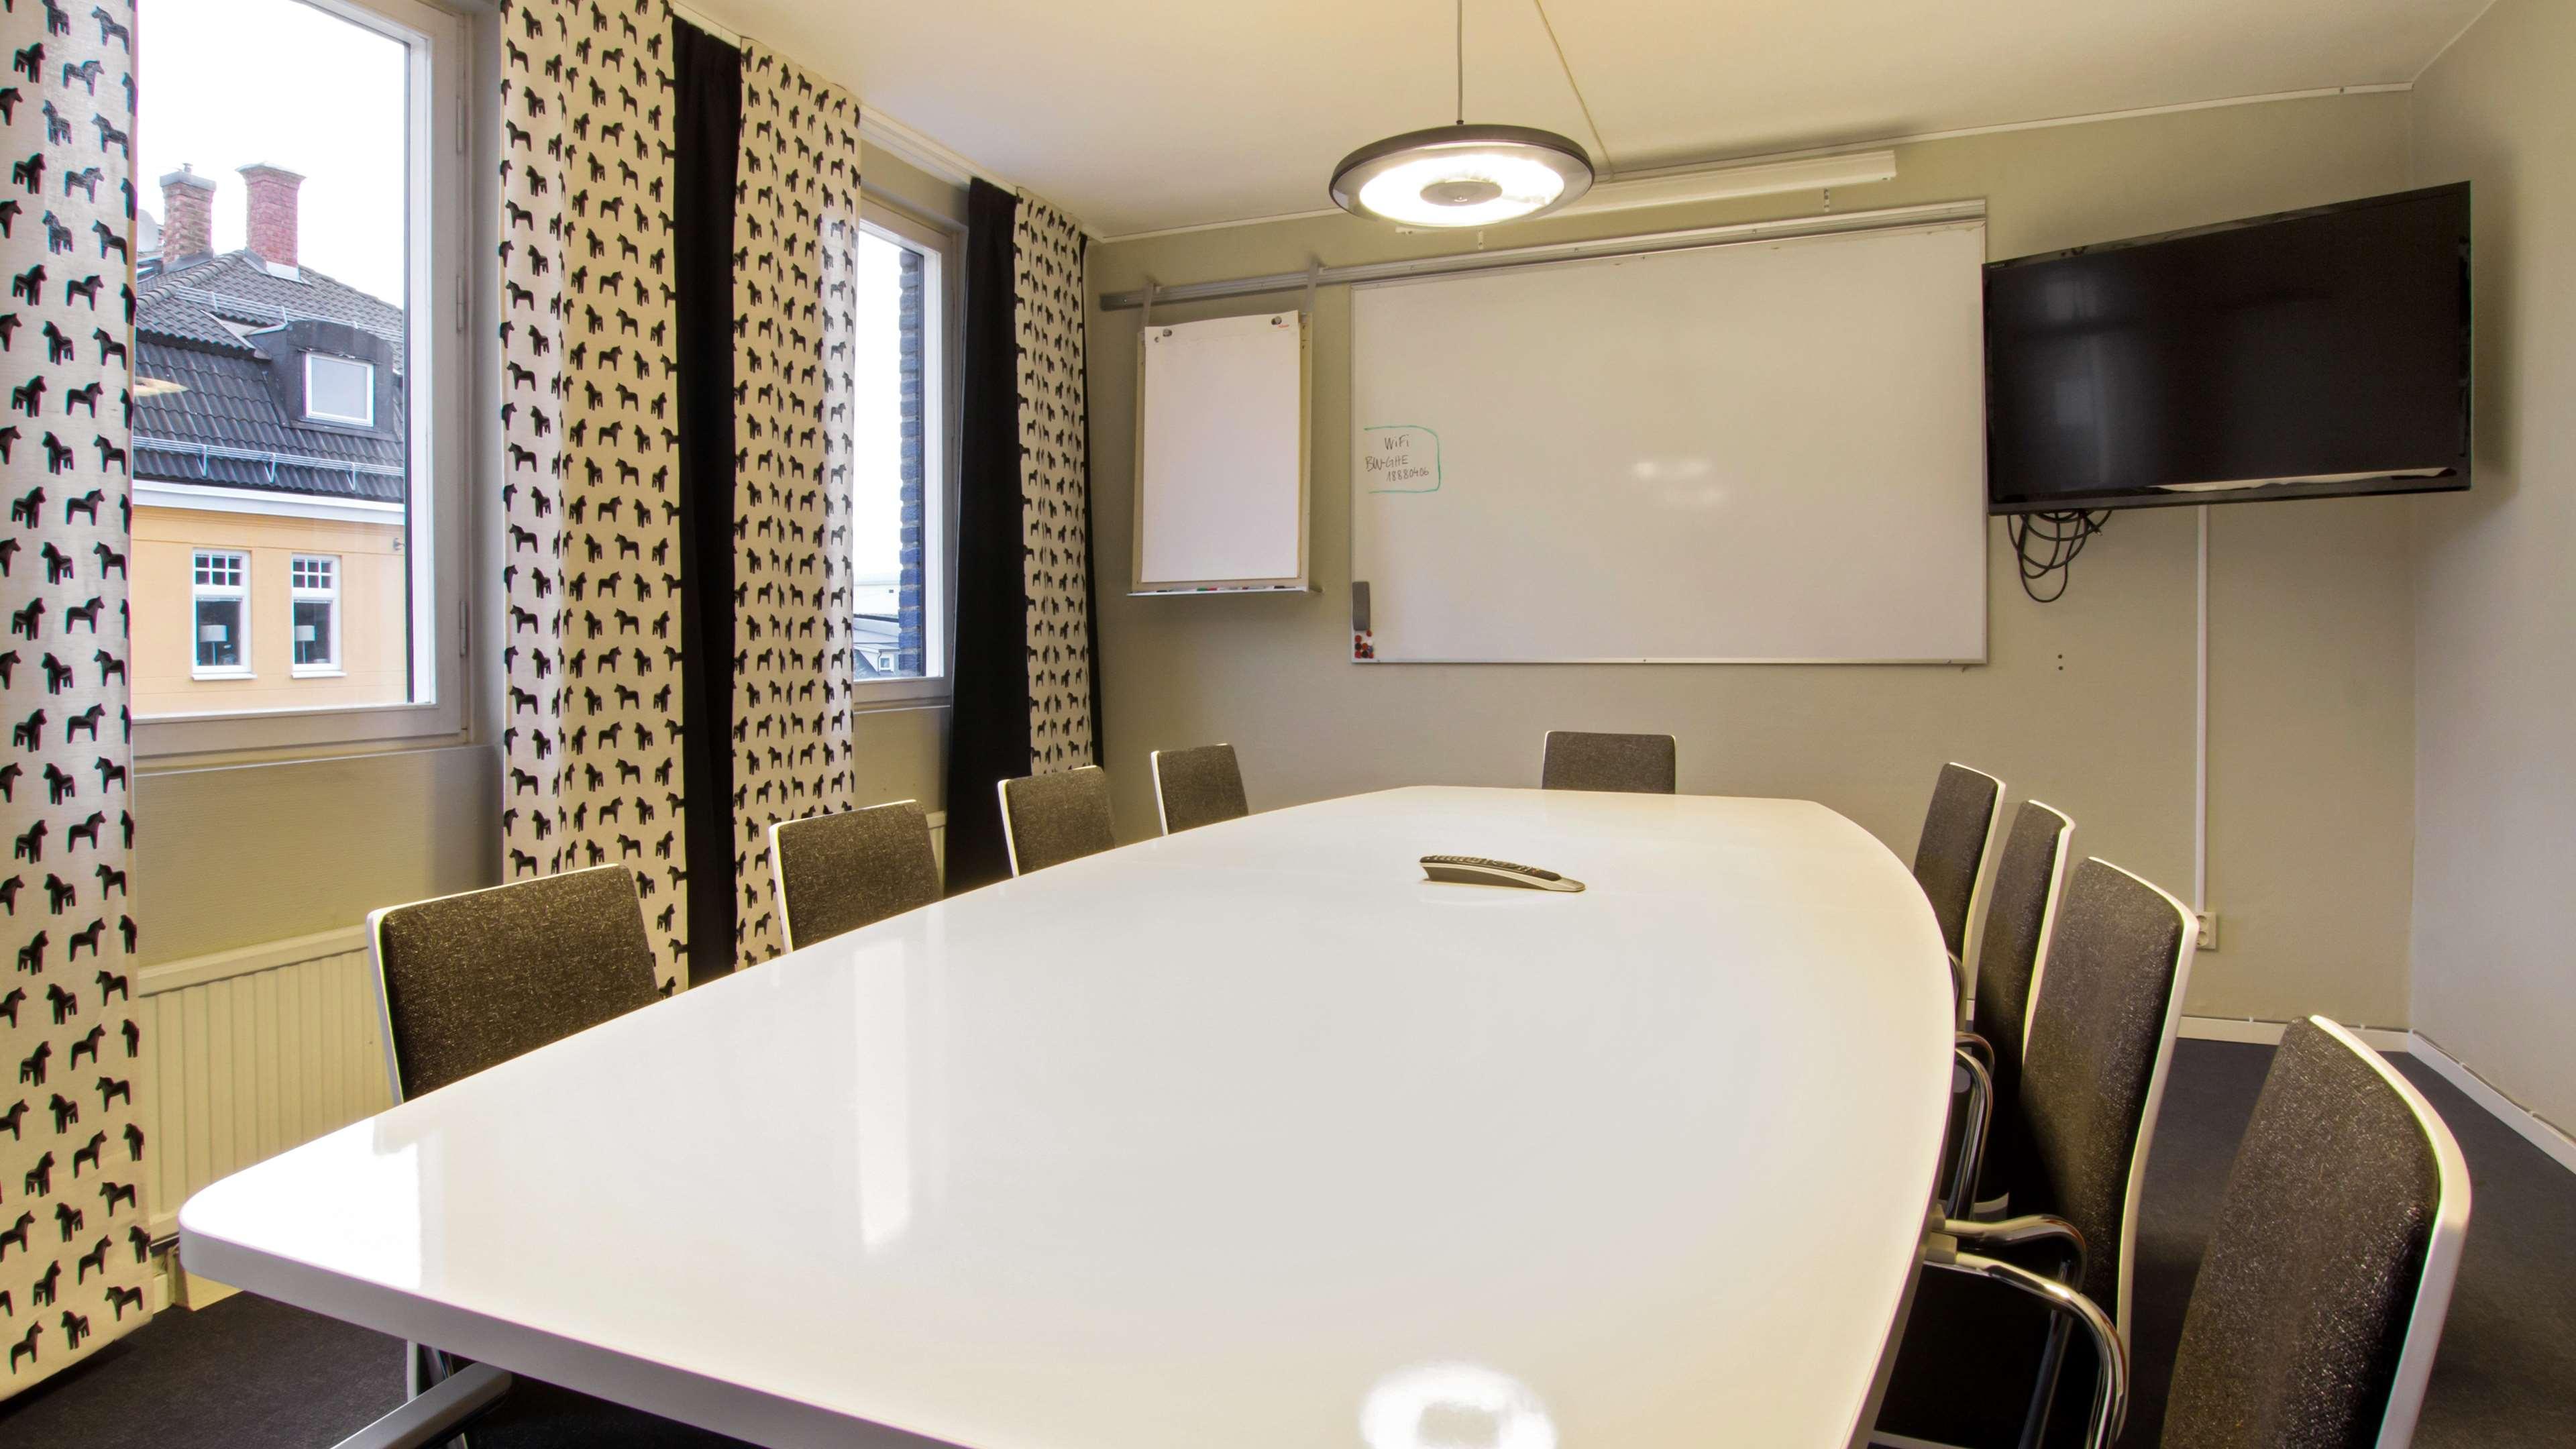 Frekvens Meeting Room